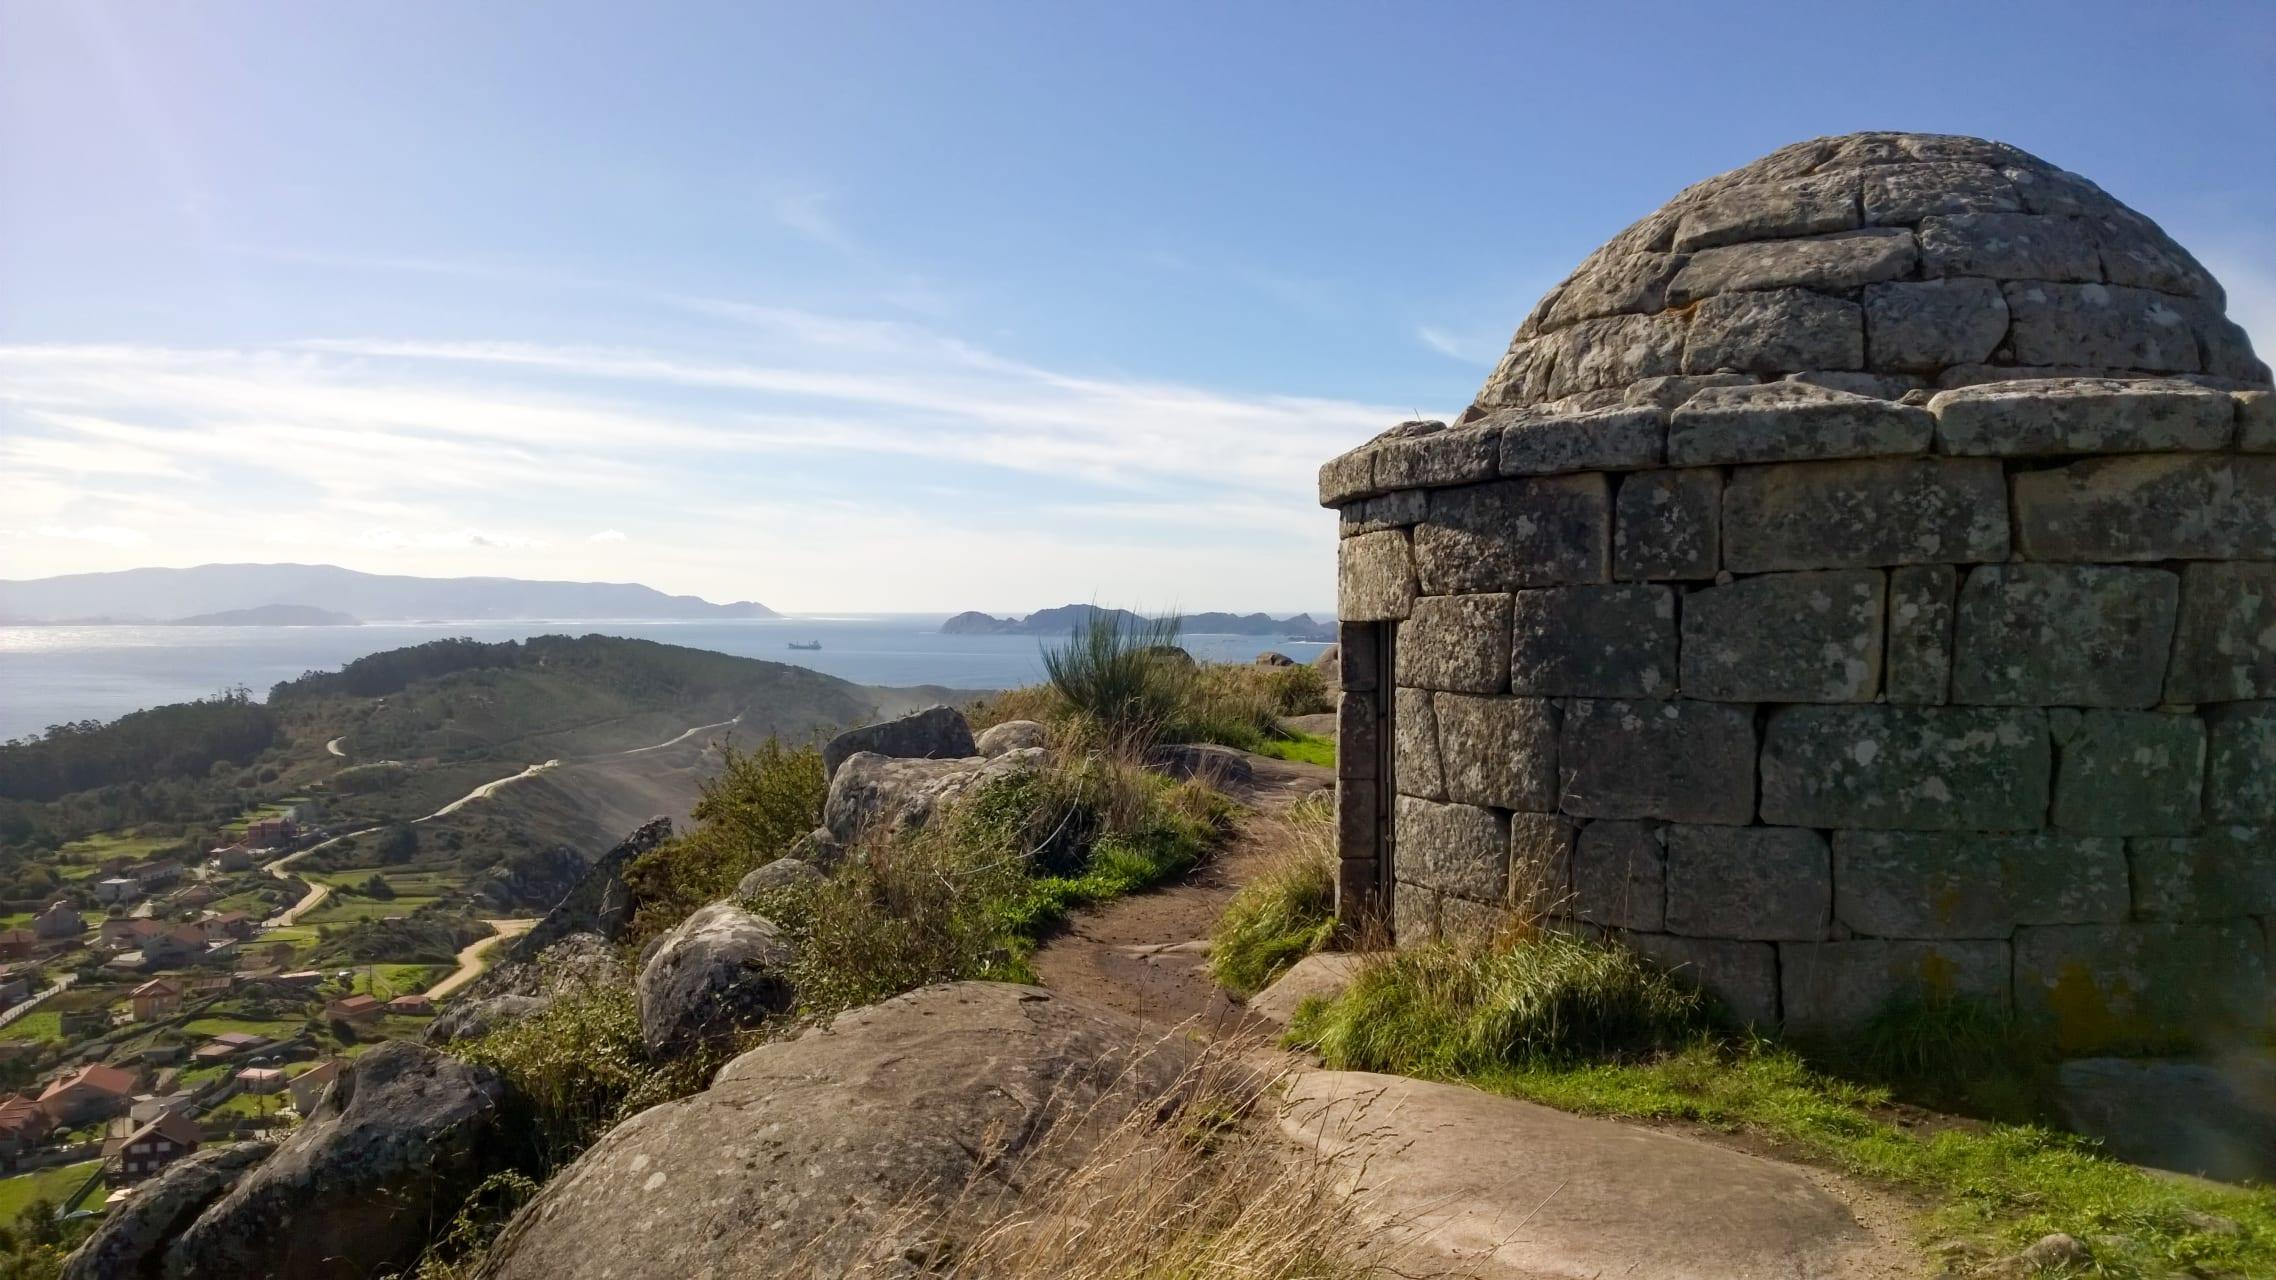 Galicia - Facho de Donon: A Celtic Hill-Fort, Roman Ruins and Ancient Lighthouse